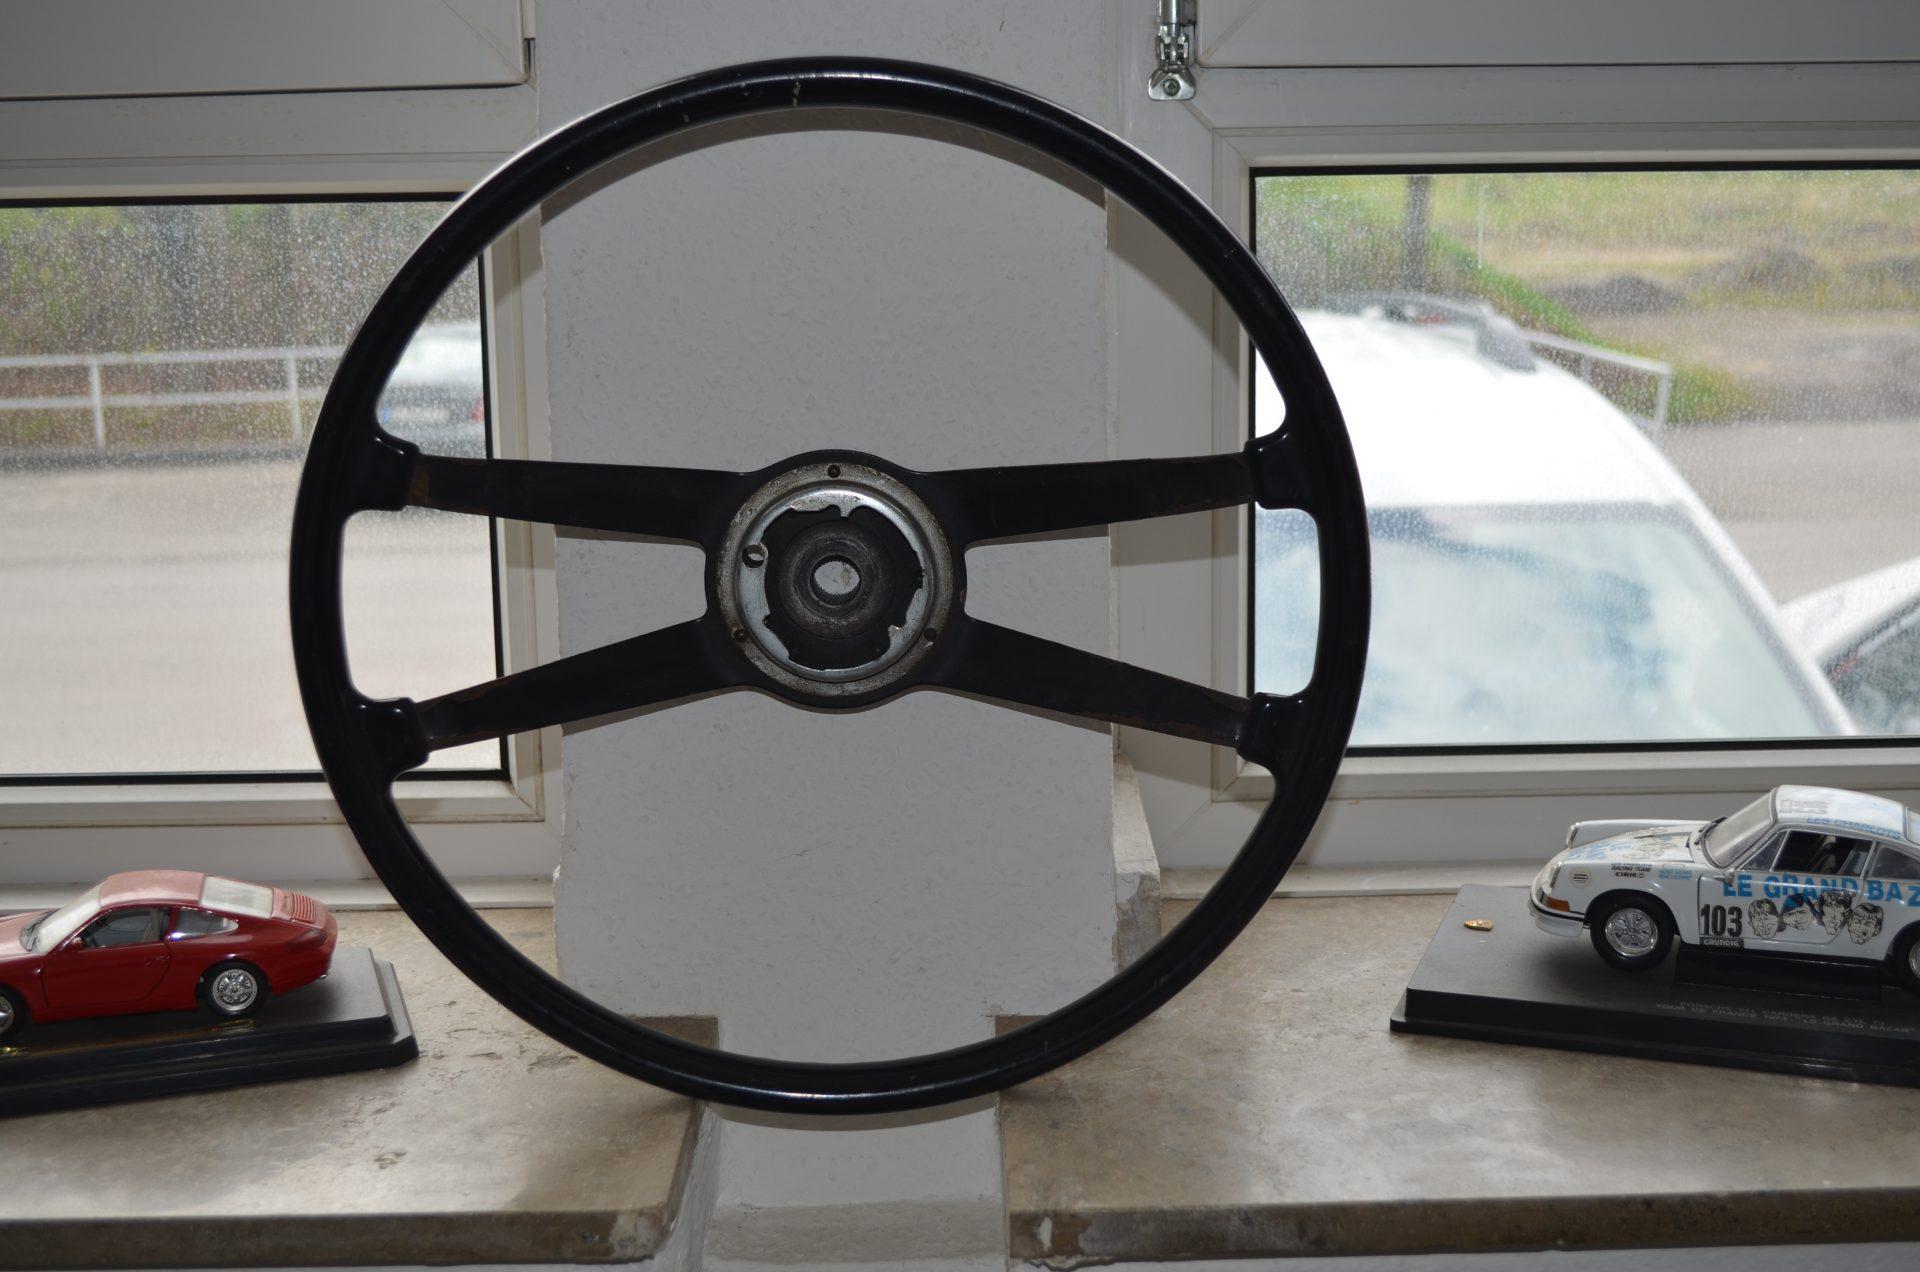 Lenkrad 40cm Durchmesser (Bekalit) Image